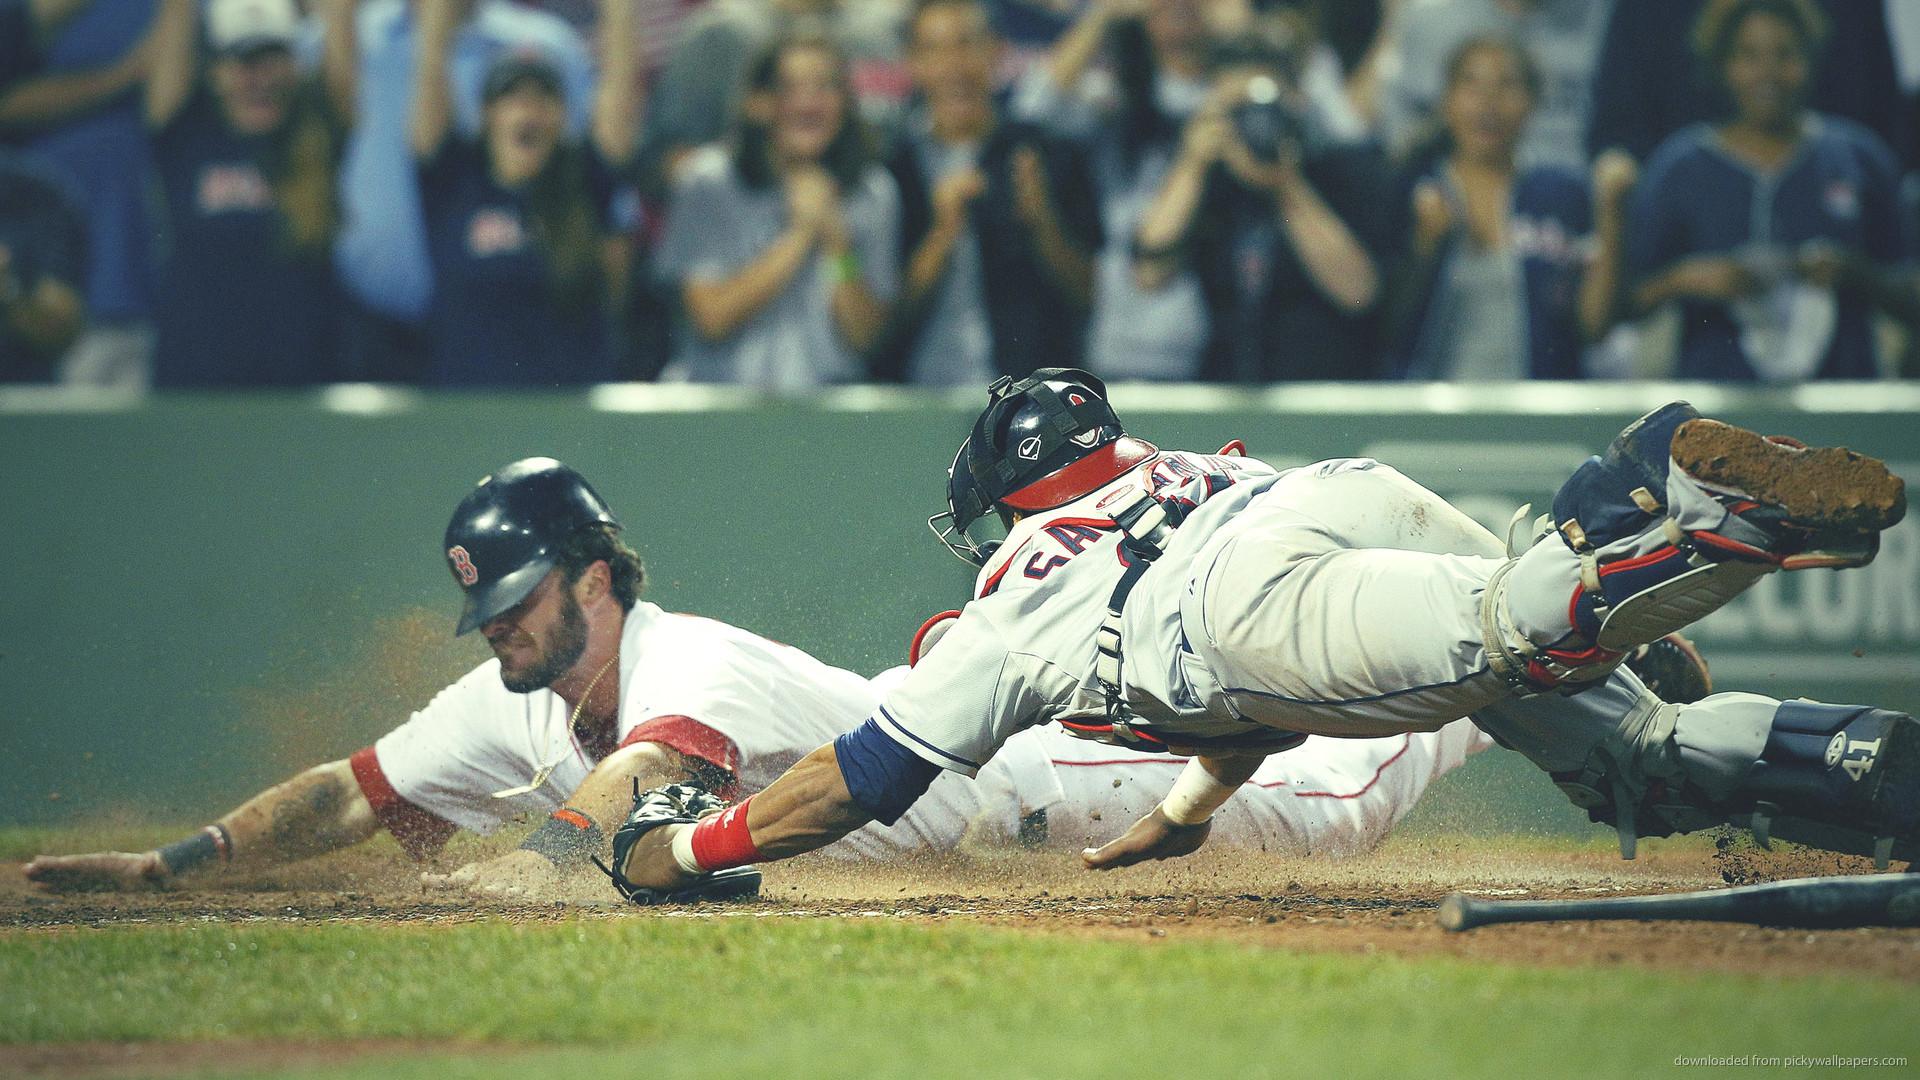 Red Sox Jarrod Saltalamacchia anв Cleveland Indians Carlos Santana picture